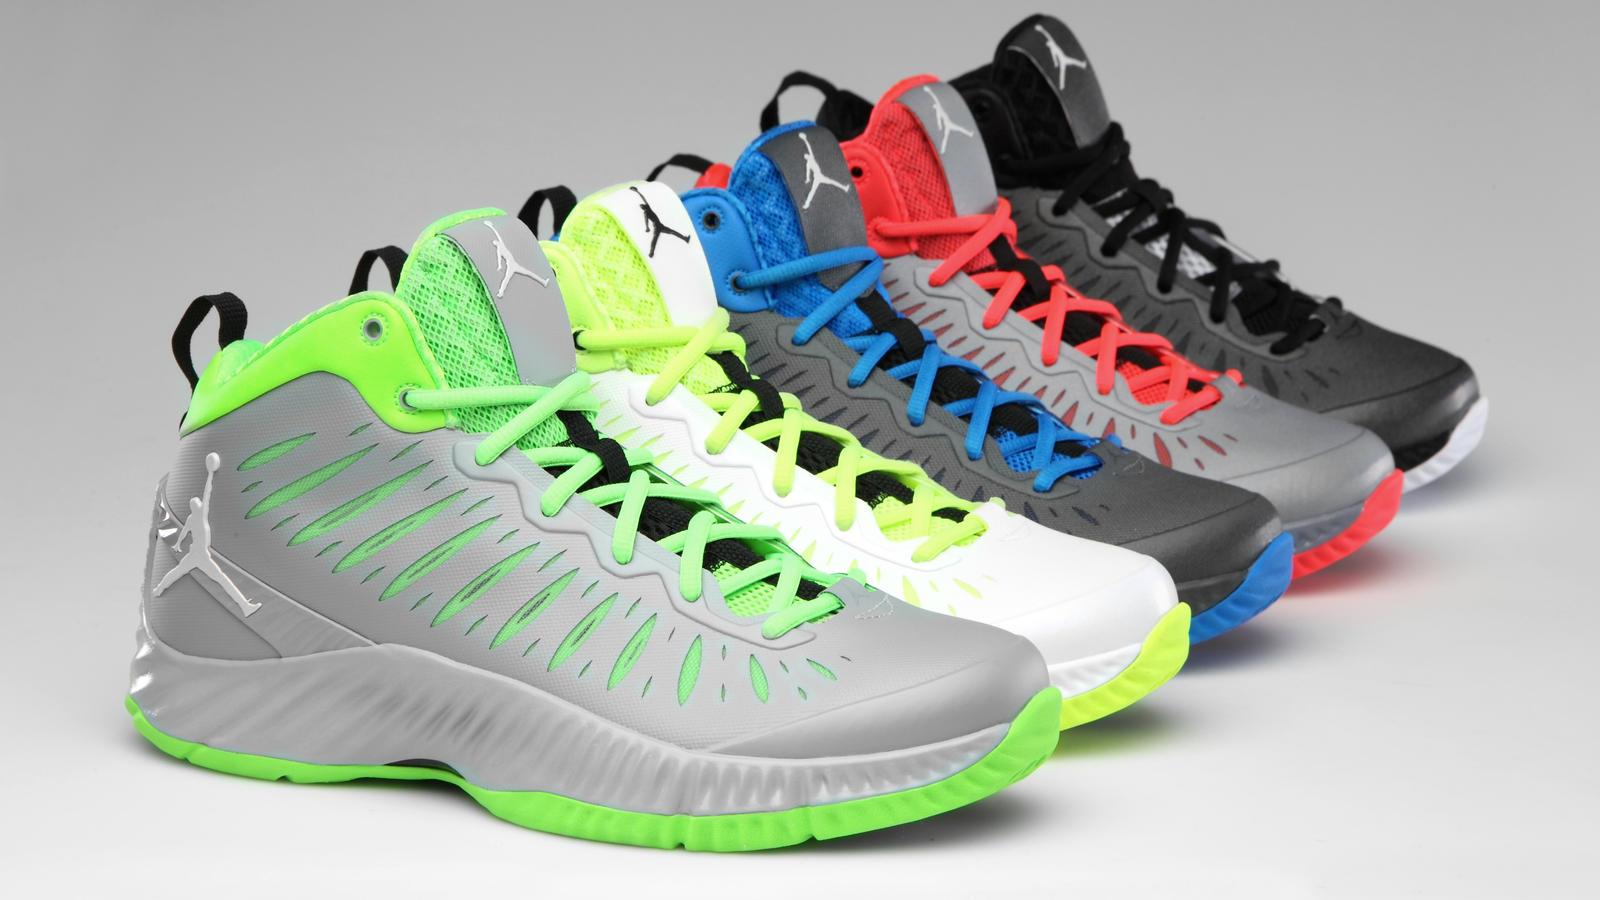 Nike Jordan Superfly